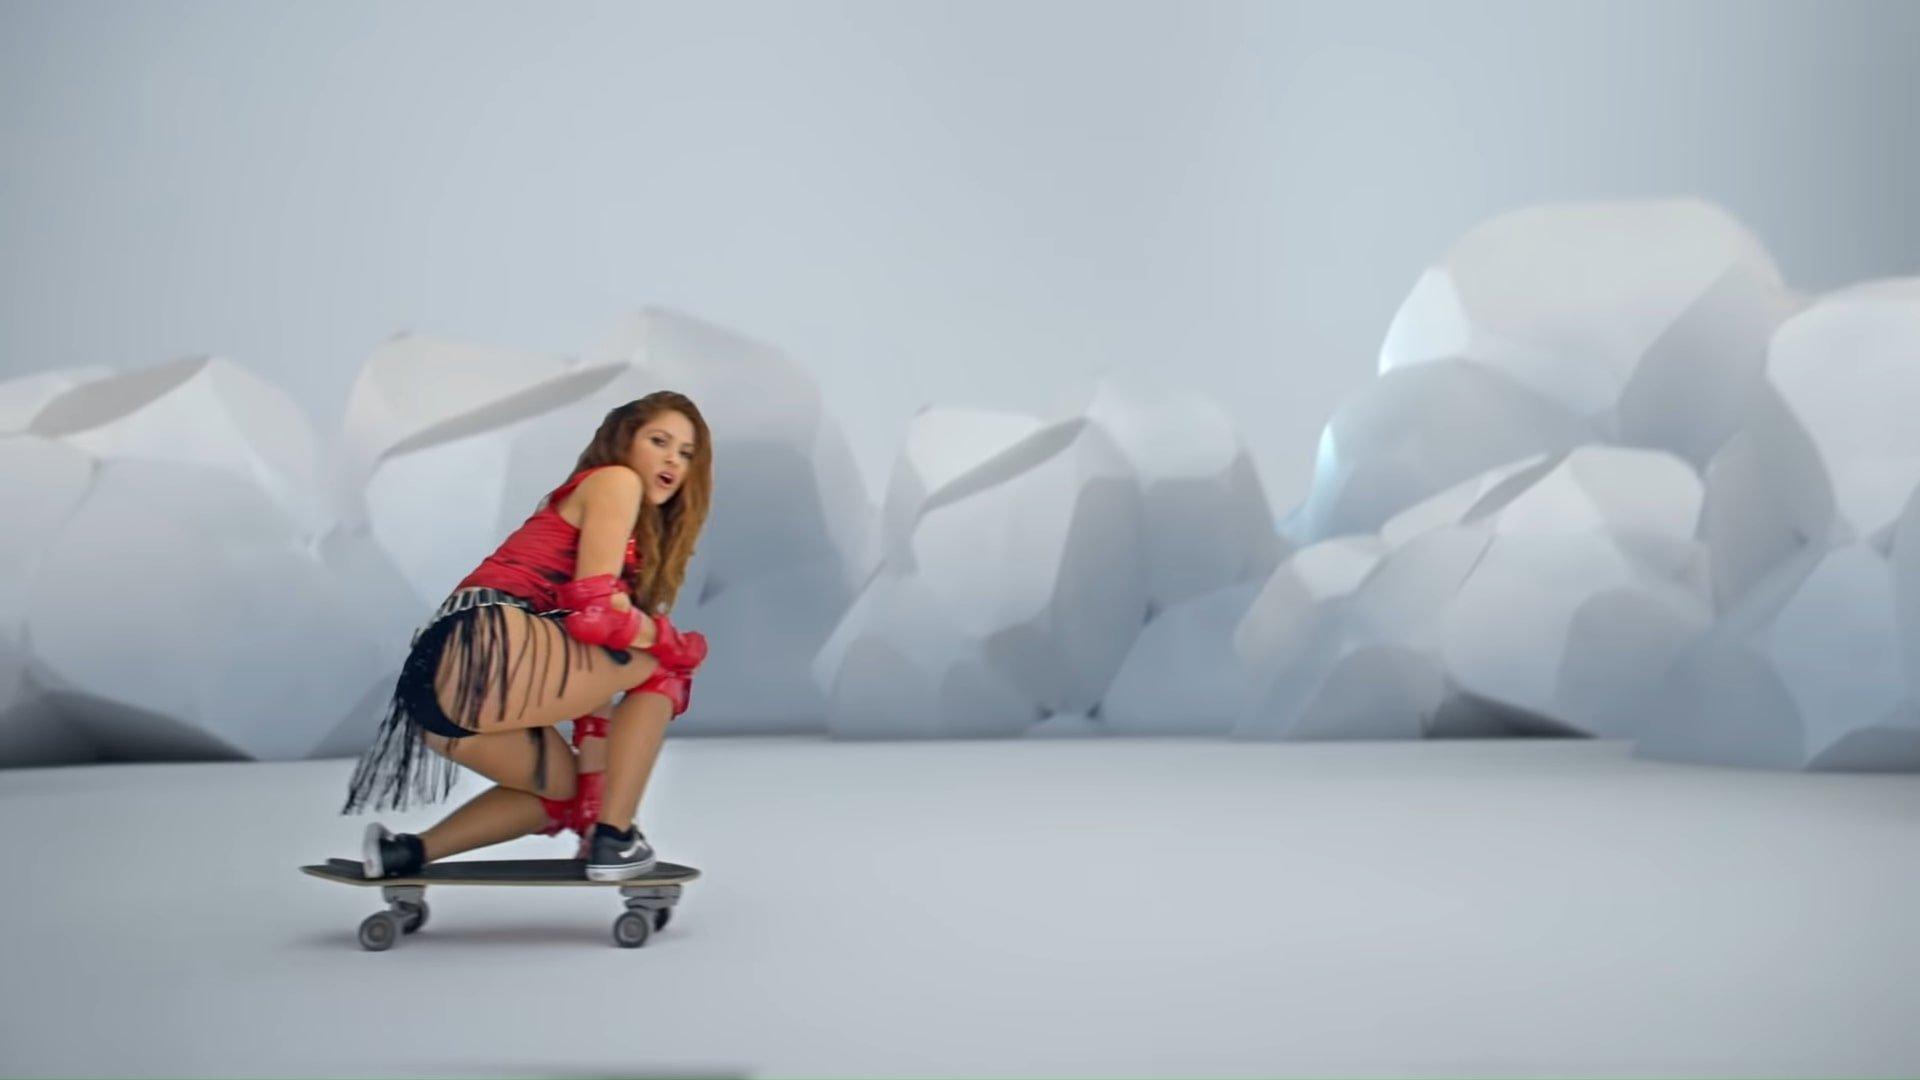 Black Eyed Peas, Shakira - GIRL LIKE ME (Official Music Video) 2-36 Screenshot